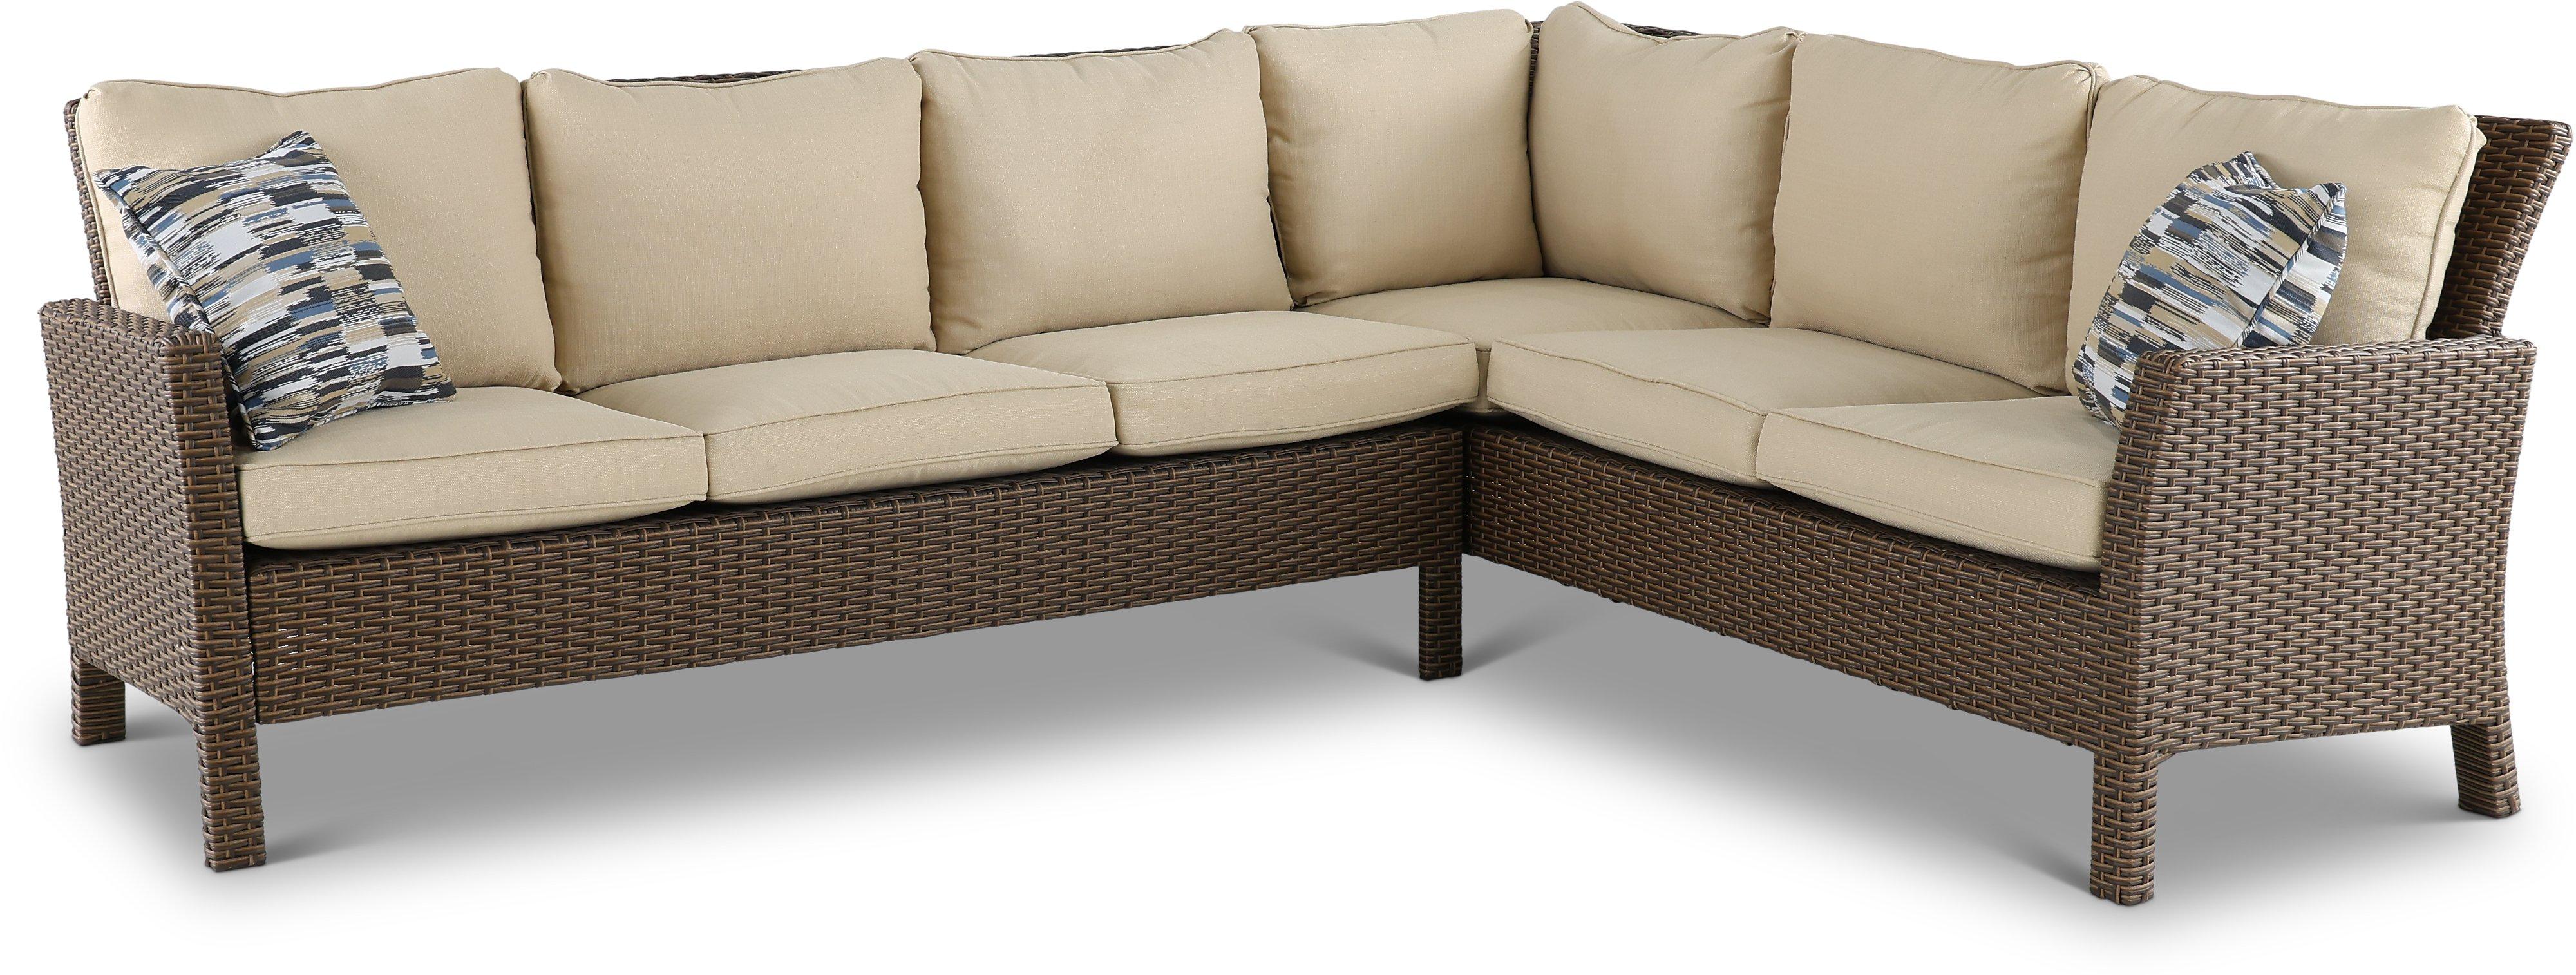 5 Piece Outdoor Patio Furniture Set Arcadia